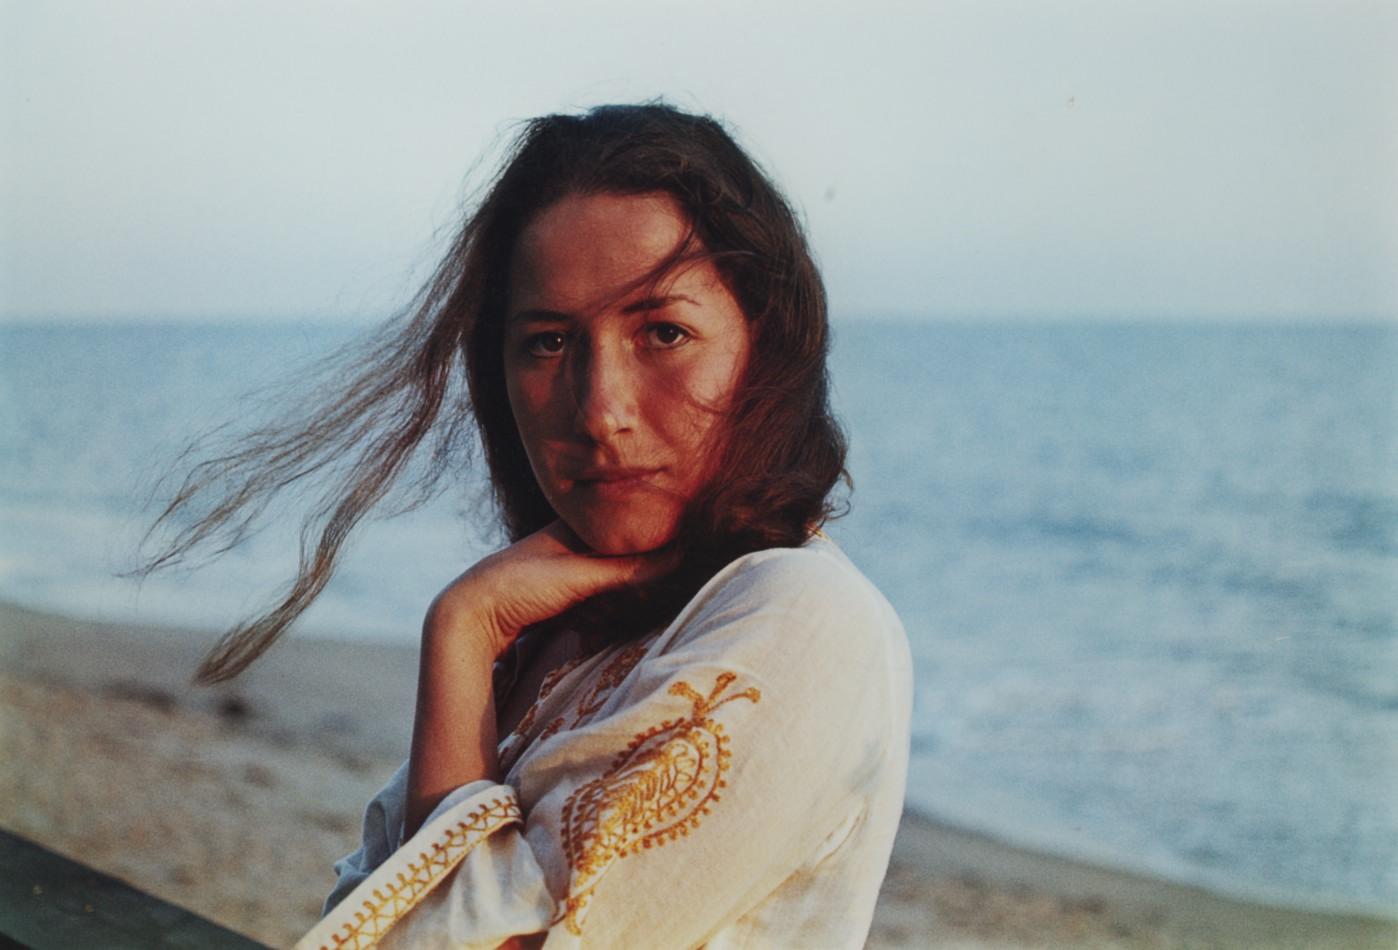 1976 LANI HALL ALPERT / MALIBU